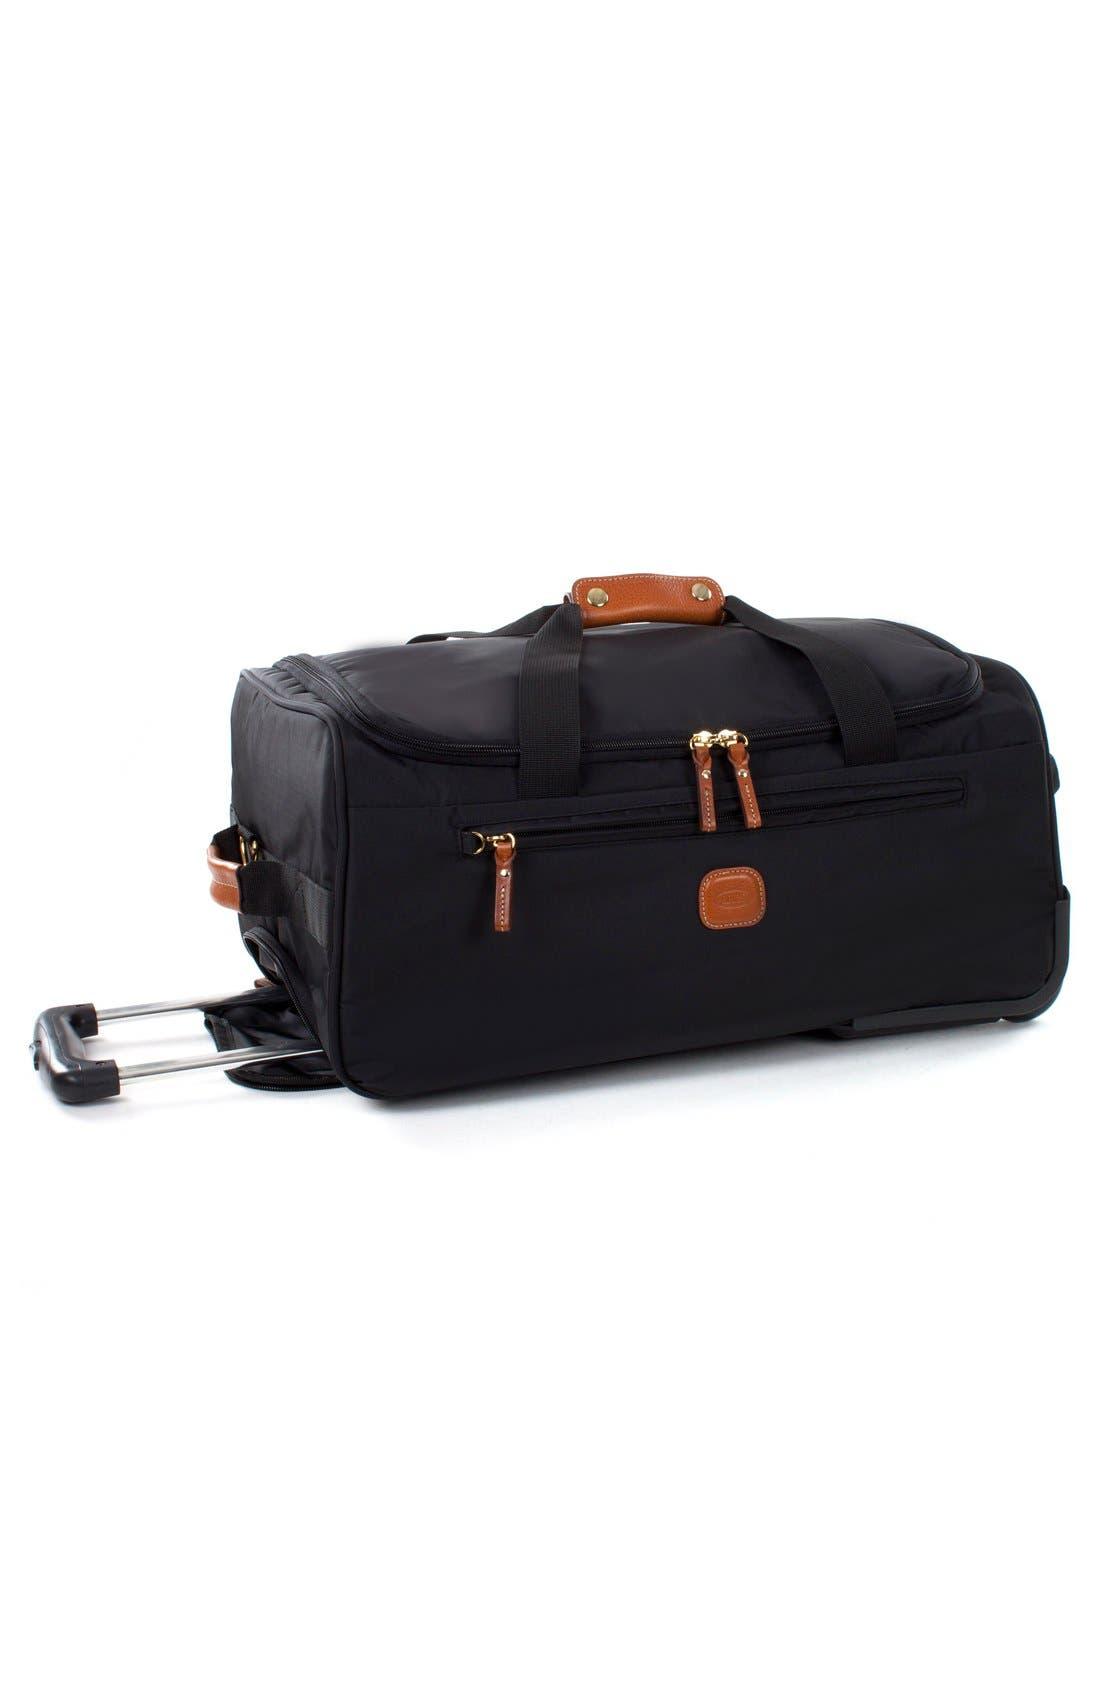 BRIC'S, Brics X-Bag 21-Inch Rolling Carry-On Duffle Bag, Alternate thumbnail 4, color, BLACK